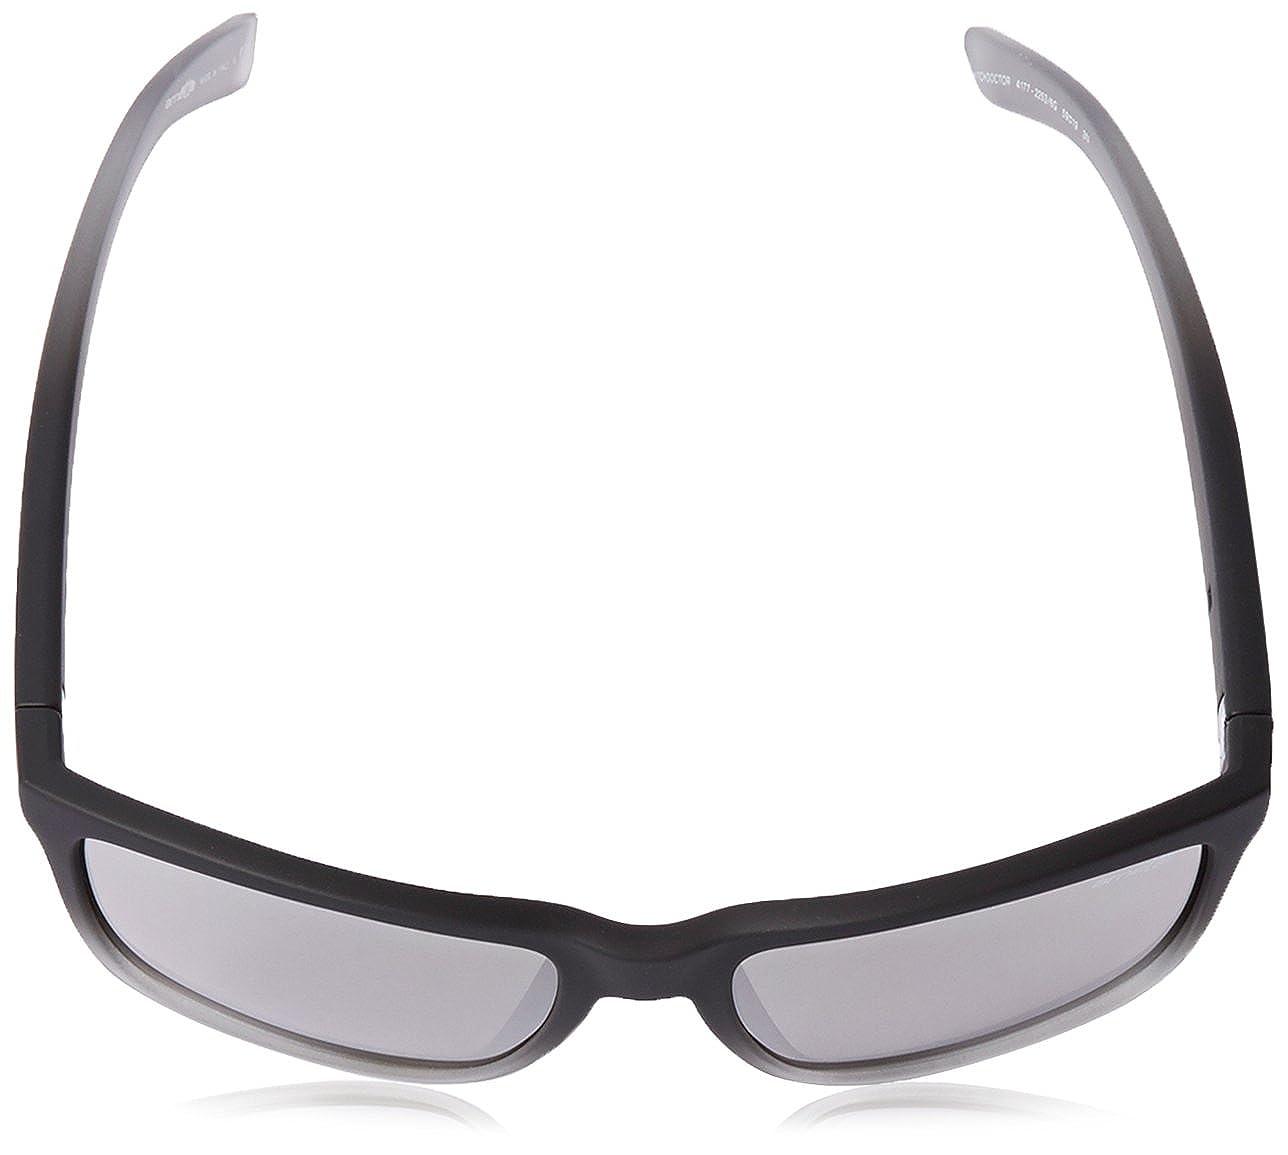 fa6f458aa0e Amazon.com  Arnette Unisex Witch Doctor Fuzzy Black Fade Chrome Mirror  Sunglasses  Arnette  Clothing